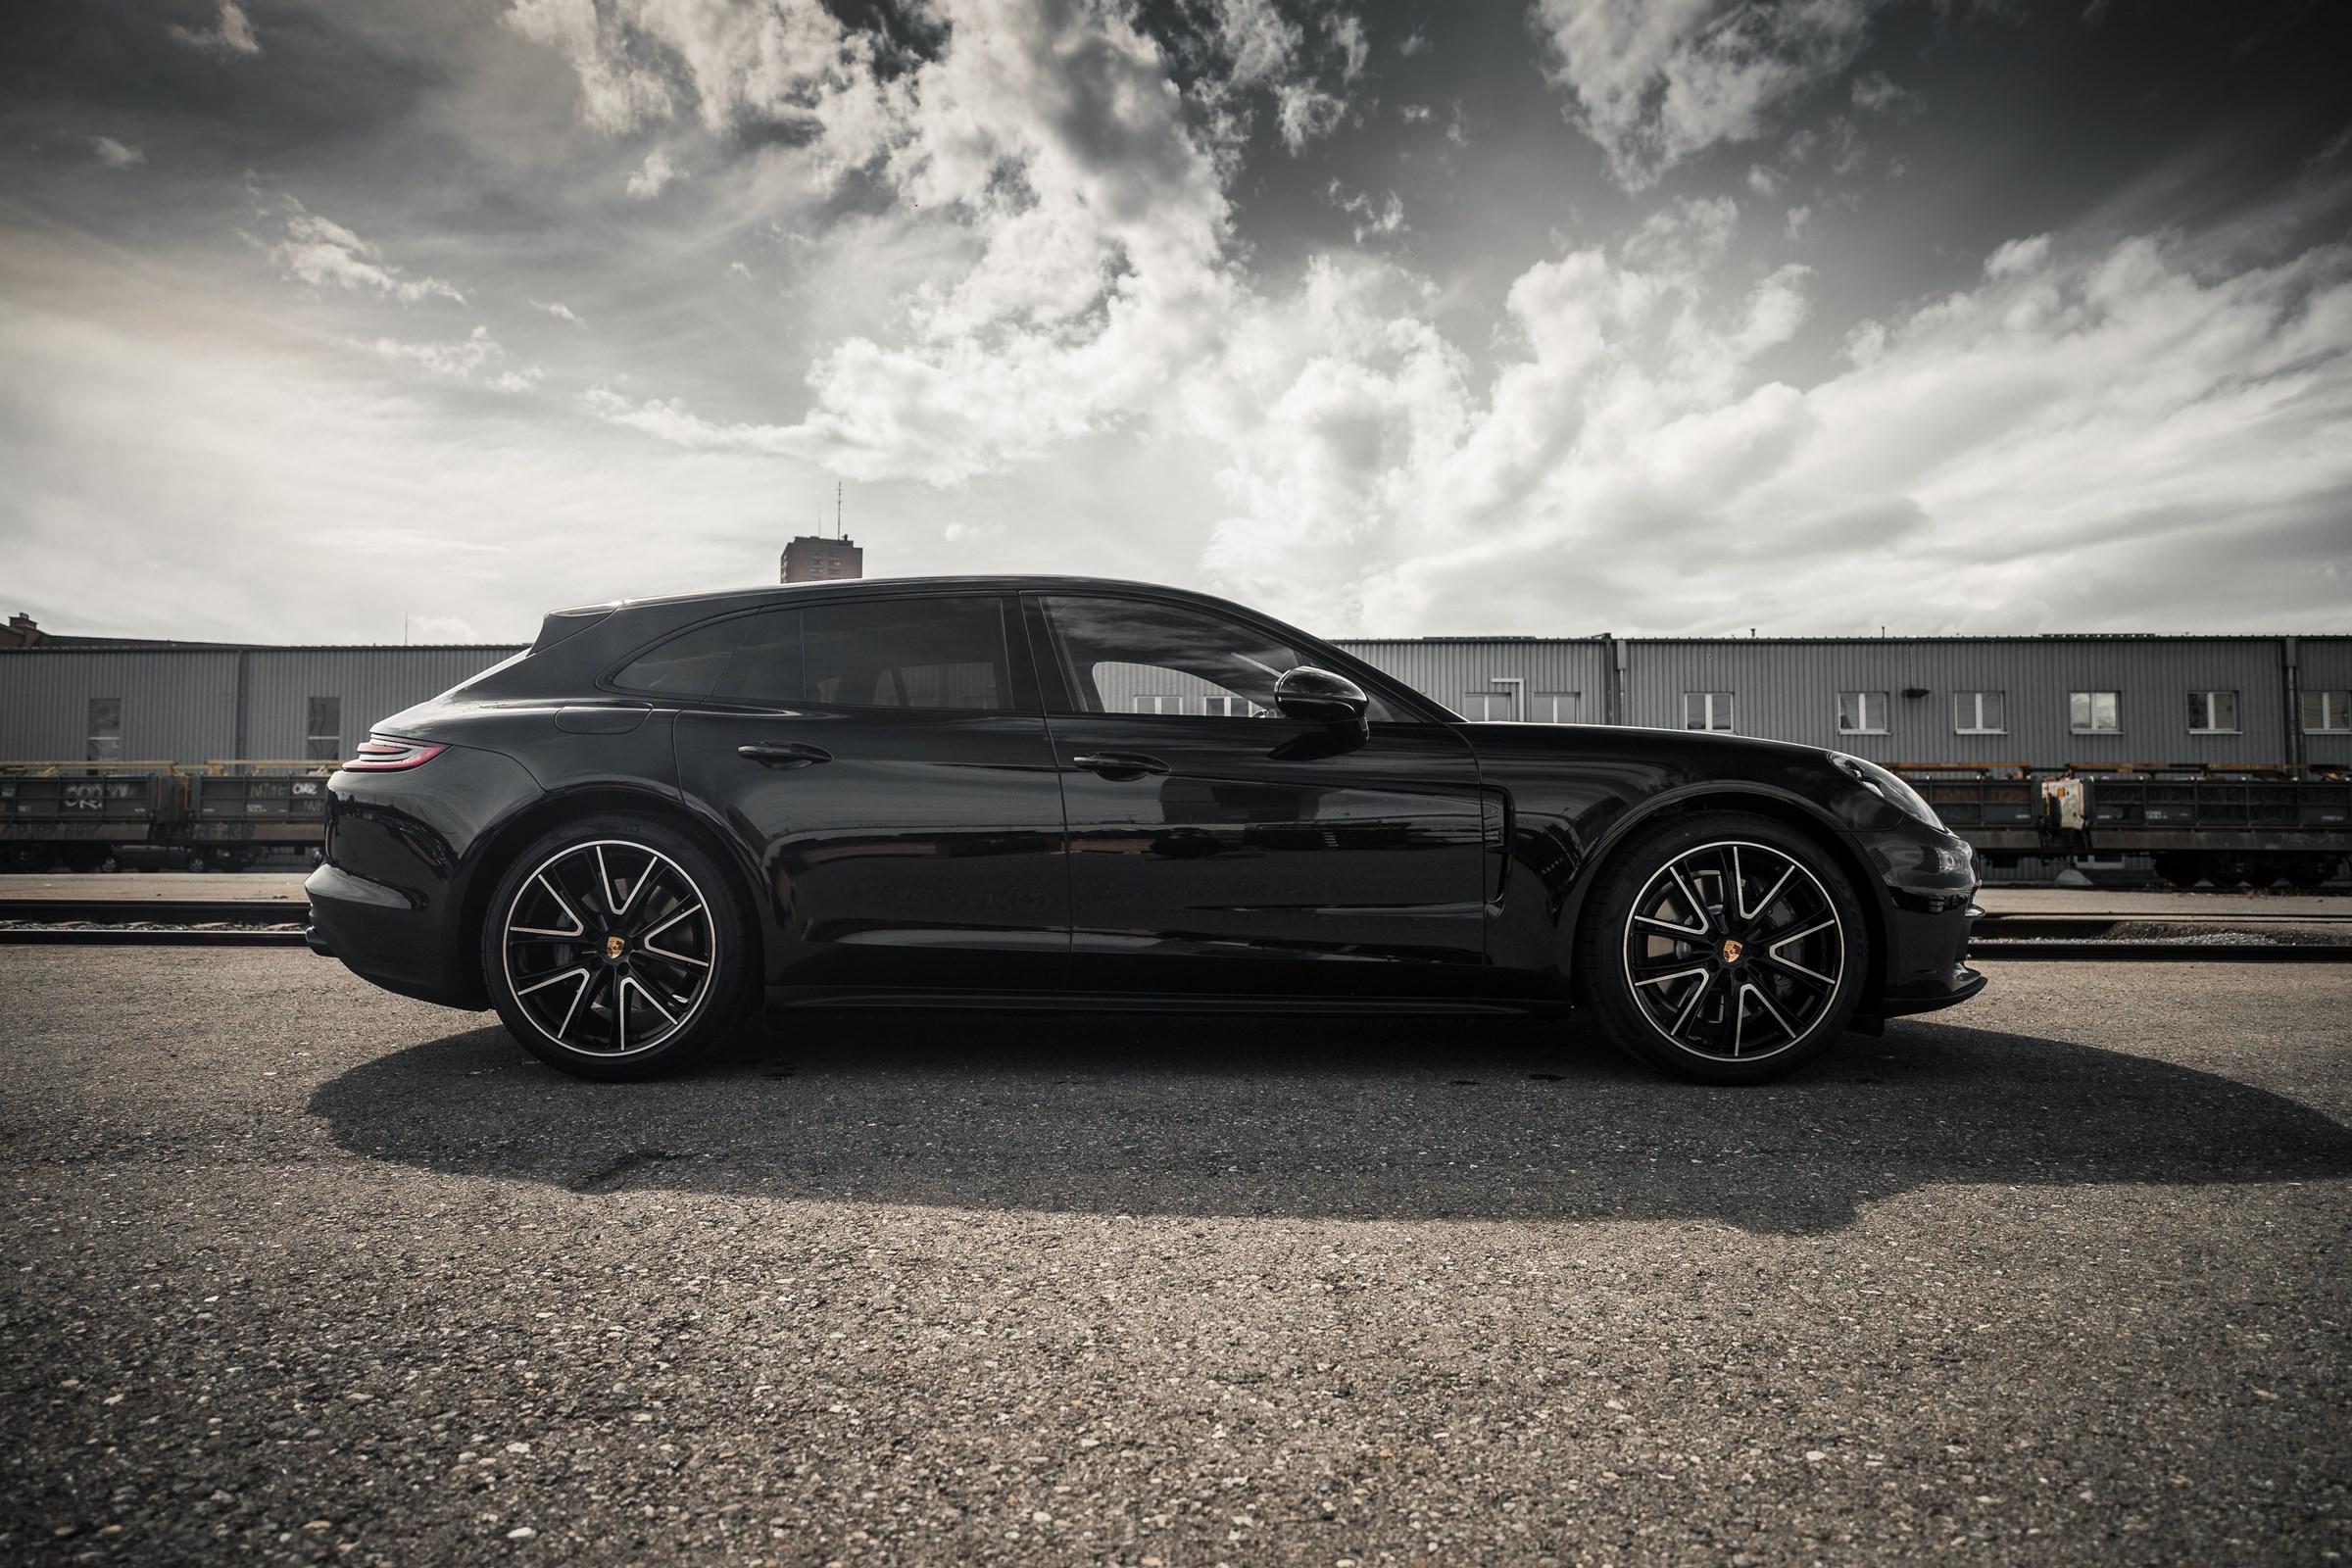 Buy New Car Sedan Porsche Panamera Gts Sport Turismo Pdk 10 Km At 149900 Chf On Carforyou Ch